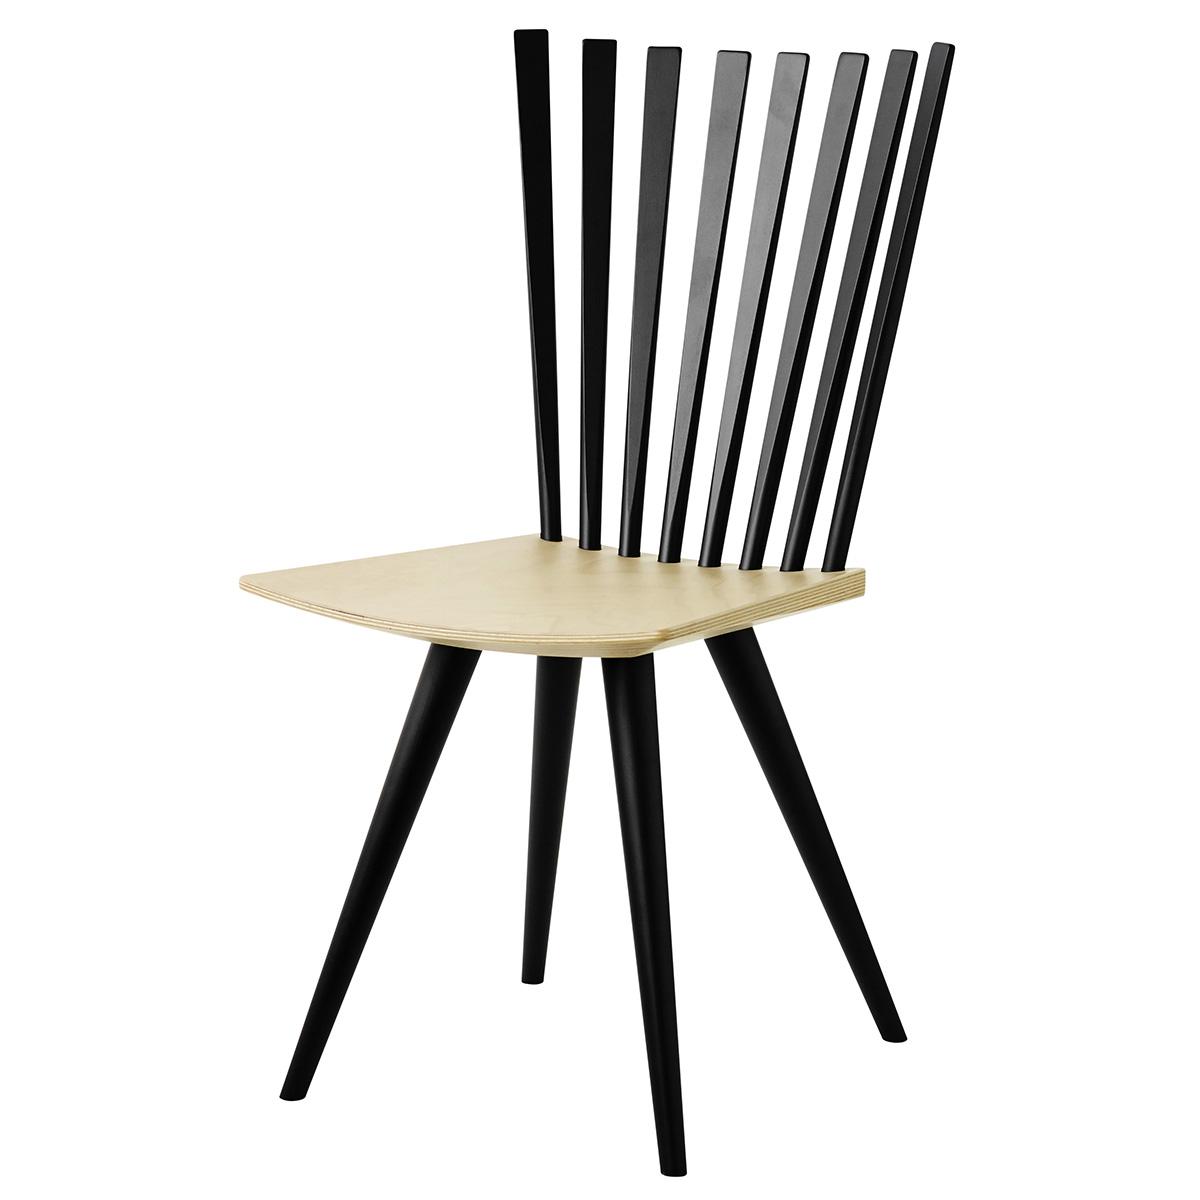 Image of   Foersom & Hiort-Lorenzen stol - Mikado J152 - Sort/natur